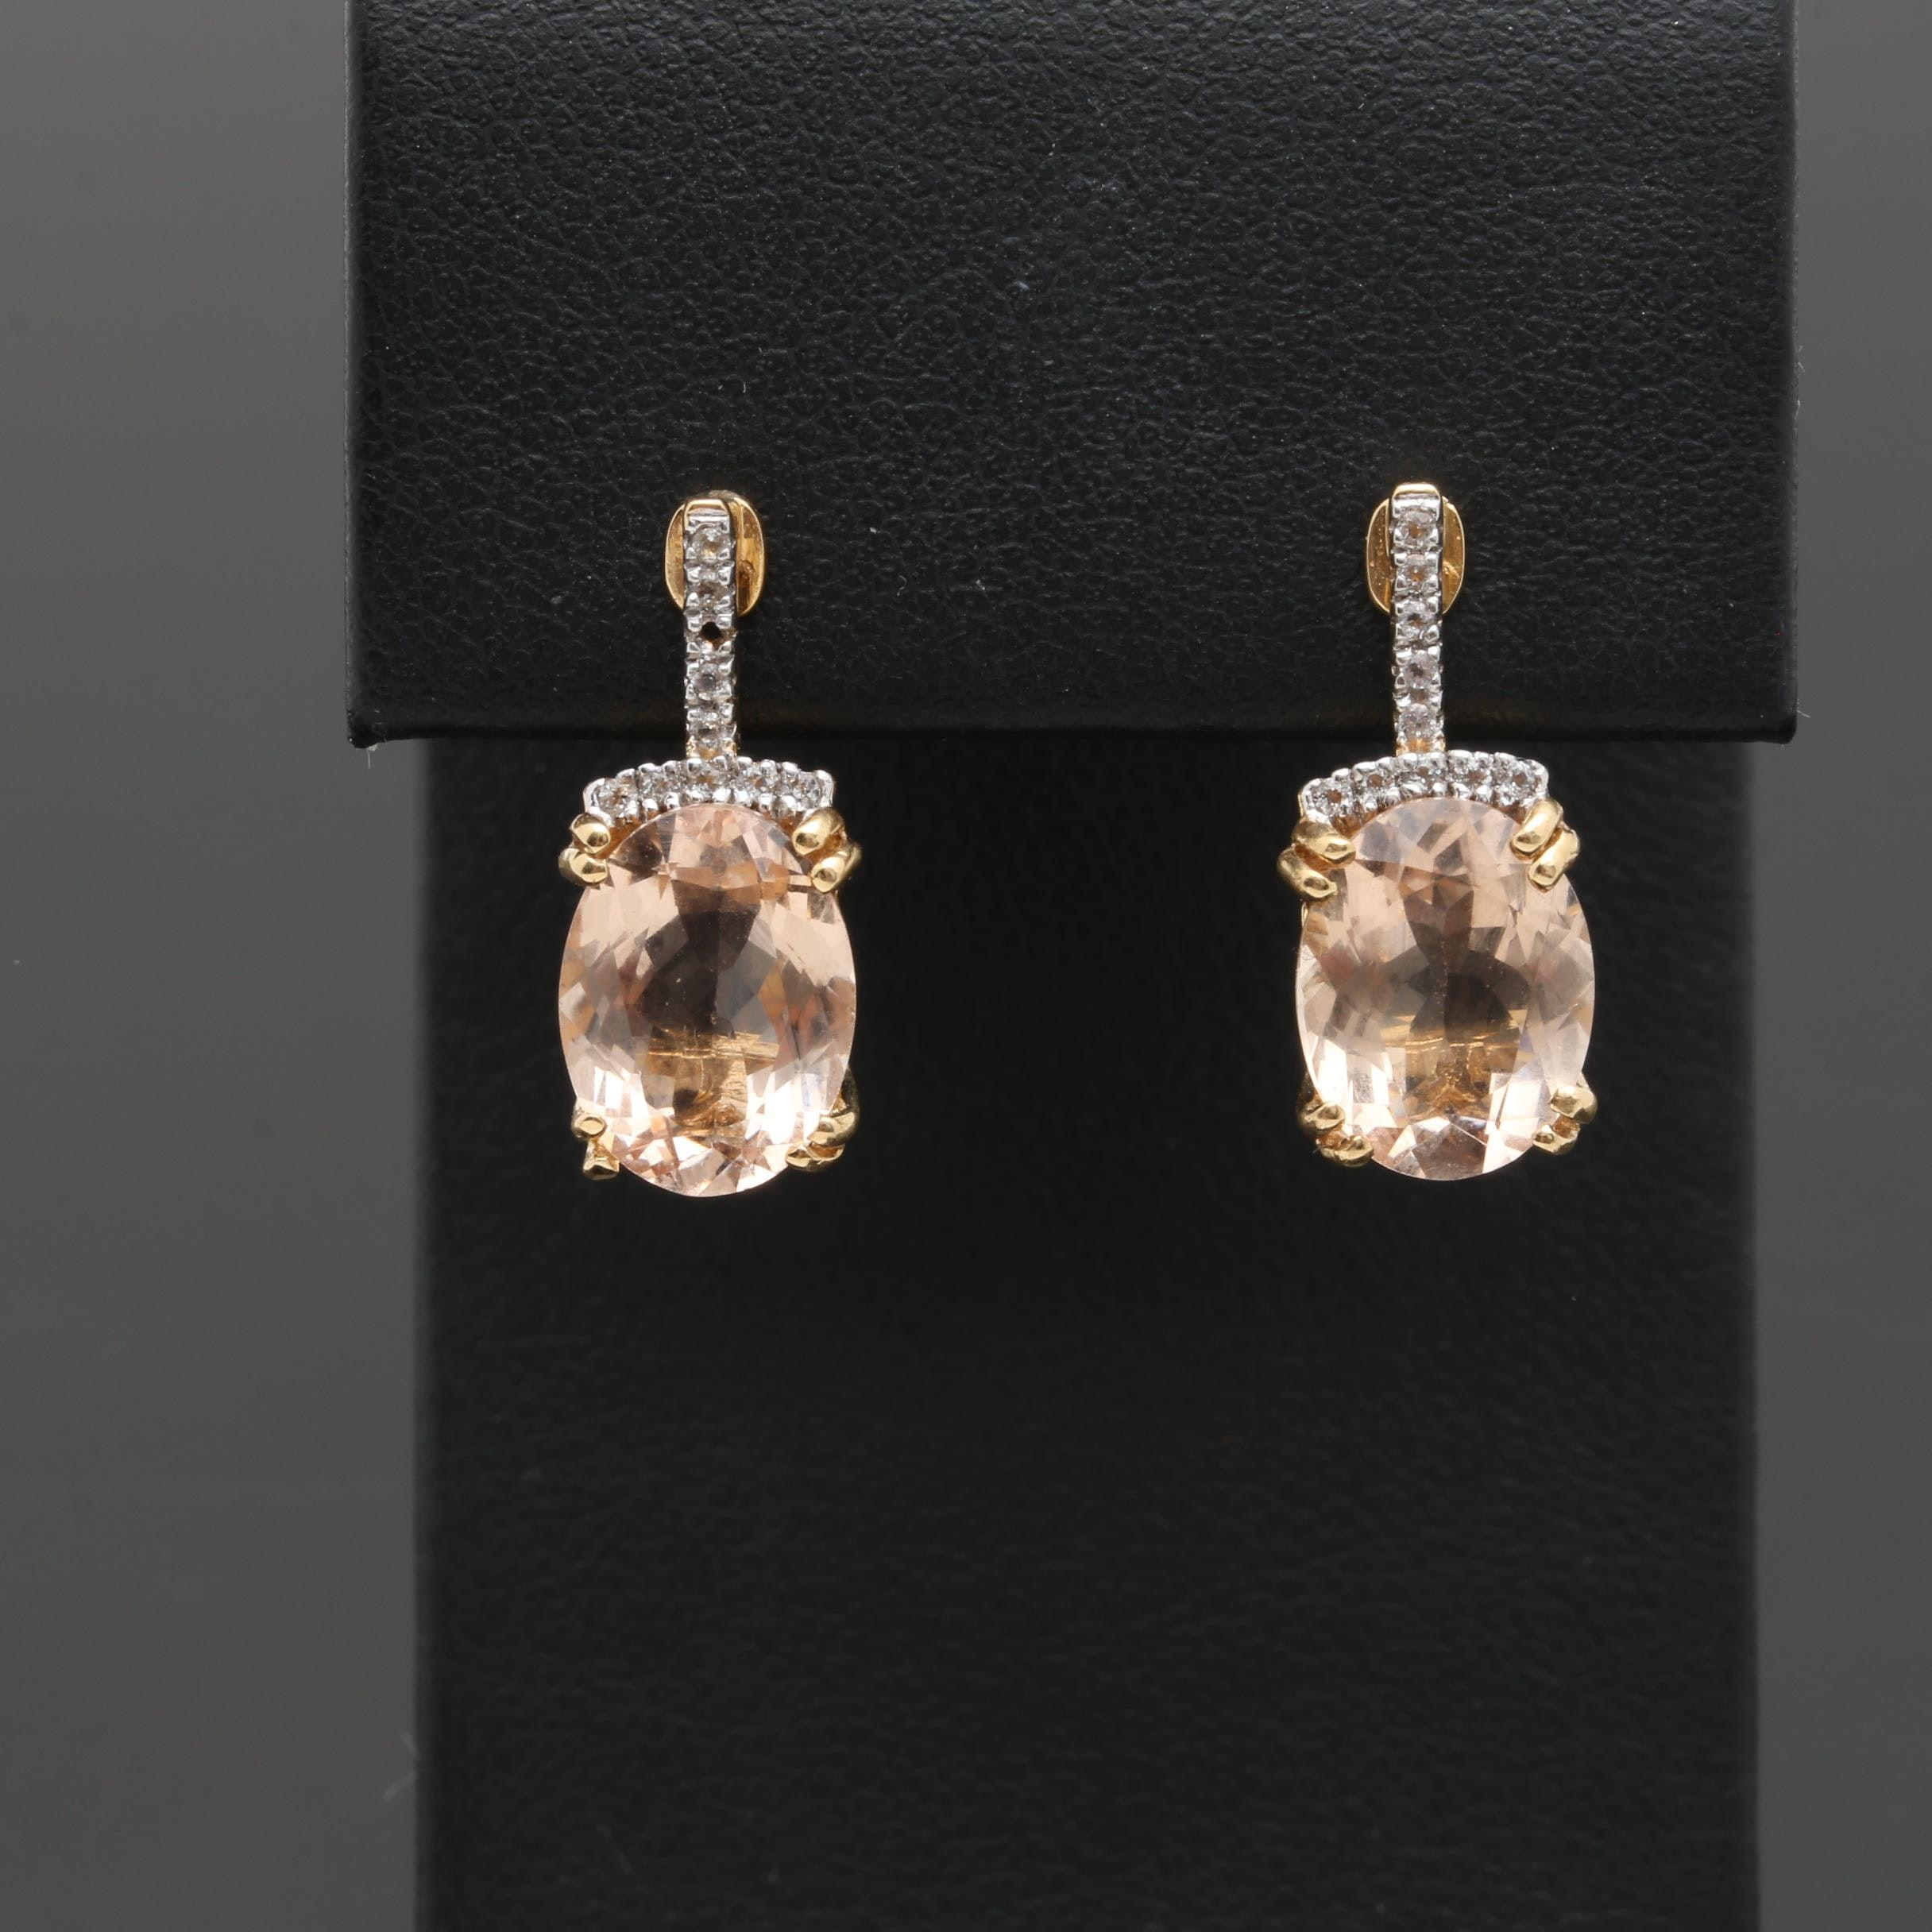 18K Yellow Gold Morganite and White Topaz Earrings